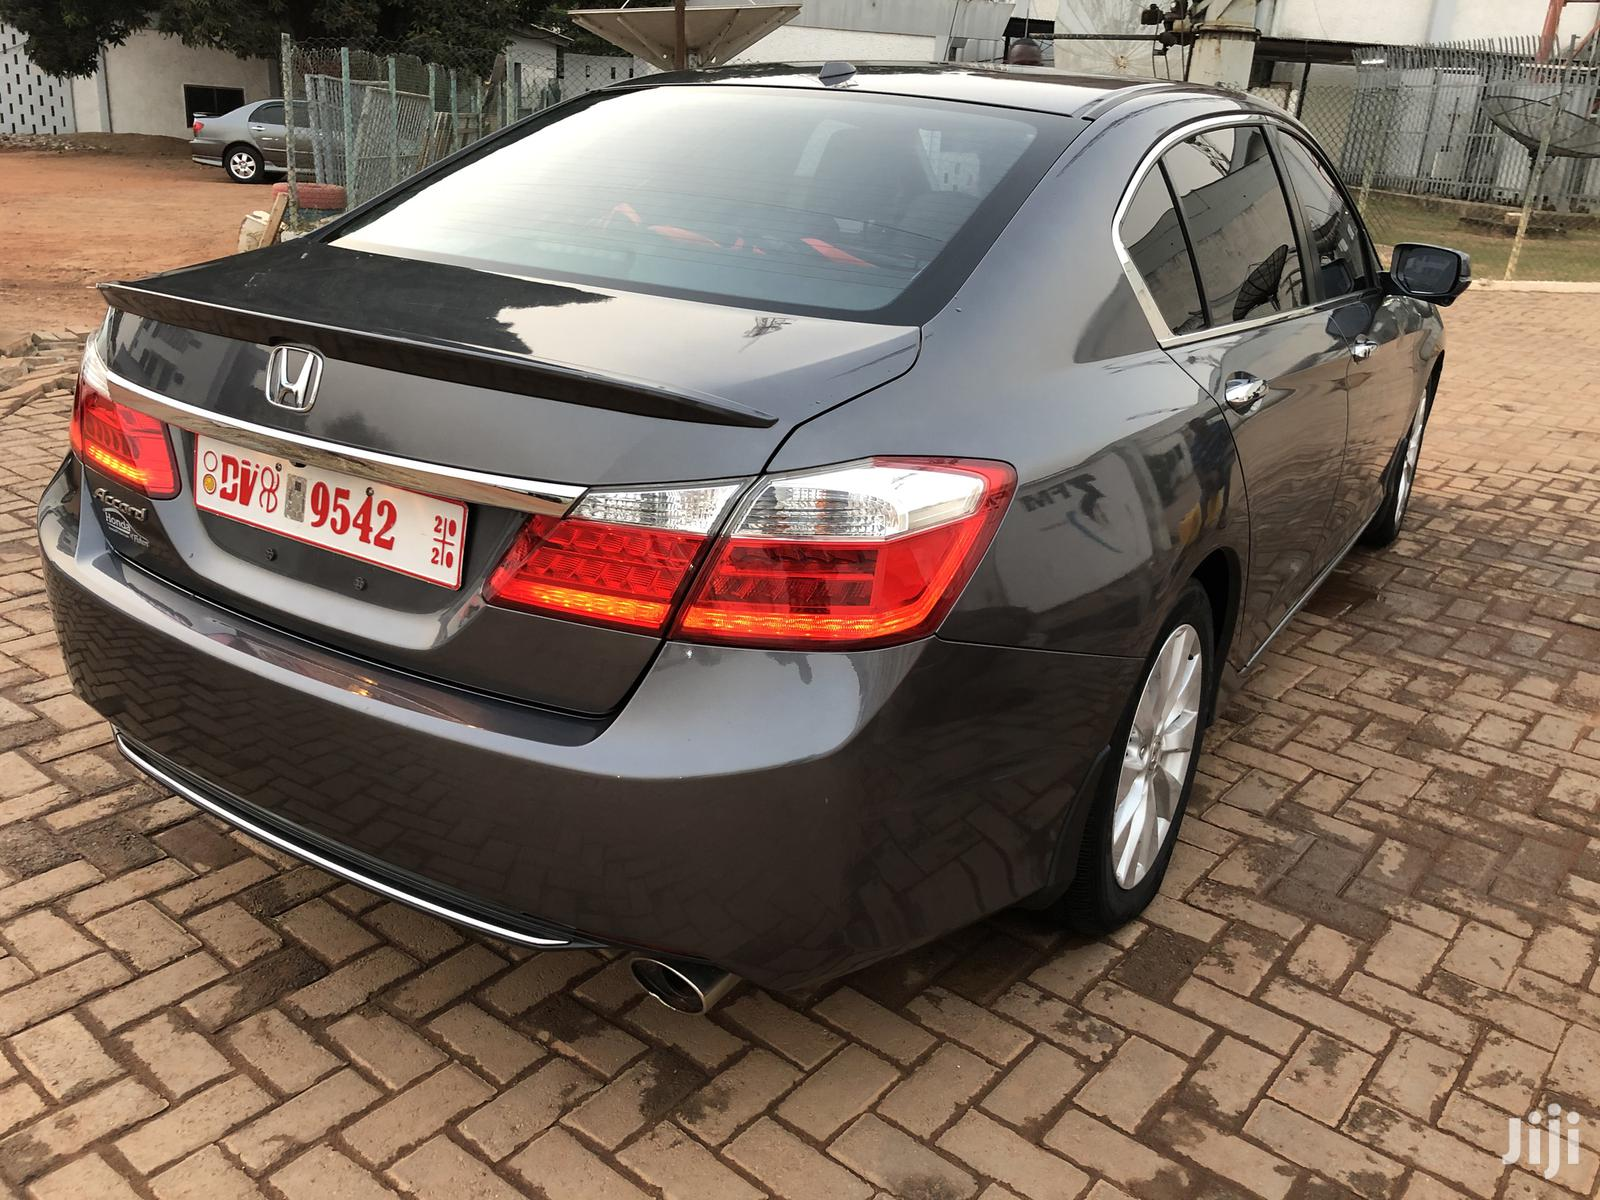 Honda Accord 2014 Gray | Cars for sale in Kanda Estate, Greater Accra, Ghana